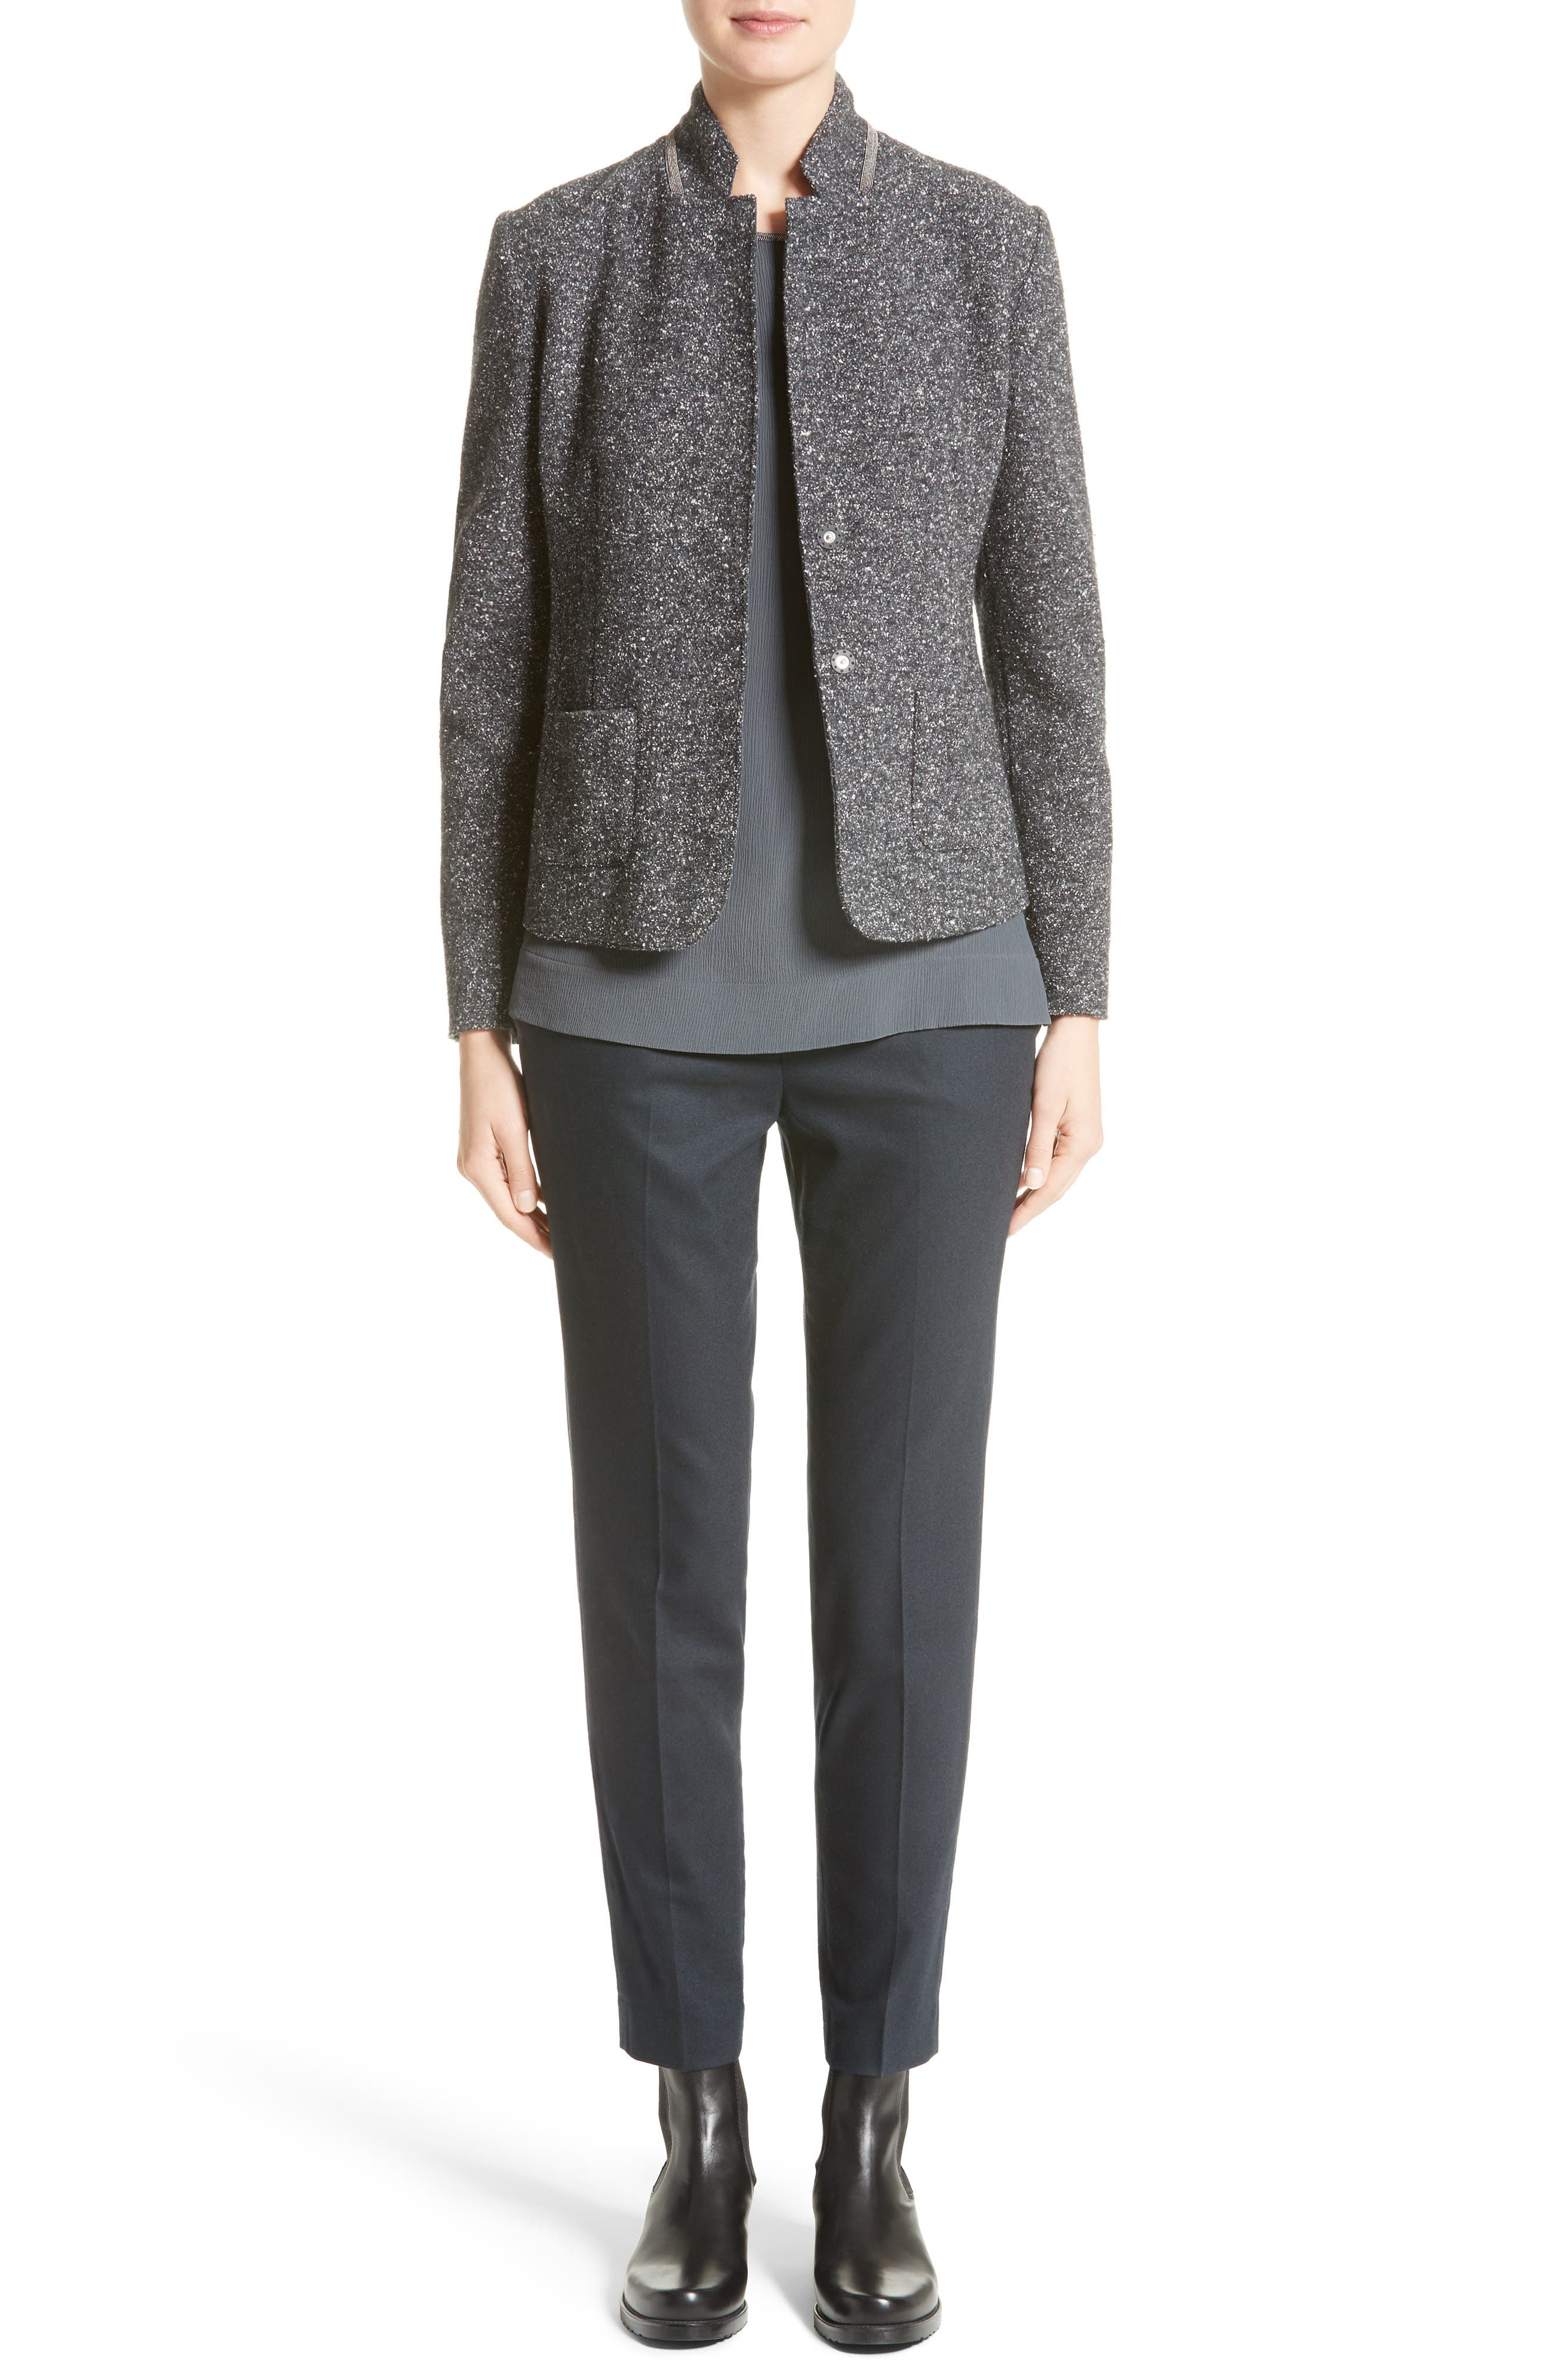 Pebble Tweed Knit Jacket,                             Alternate thumbnail 8, color,                             Grey Multi